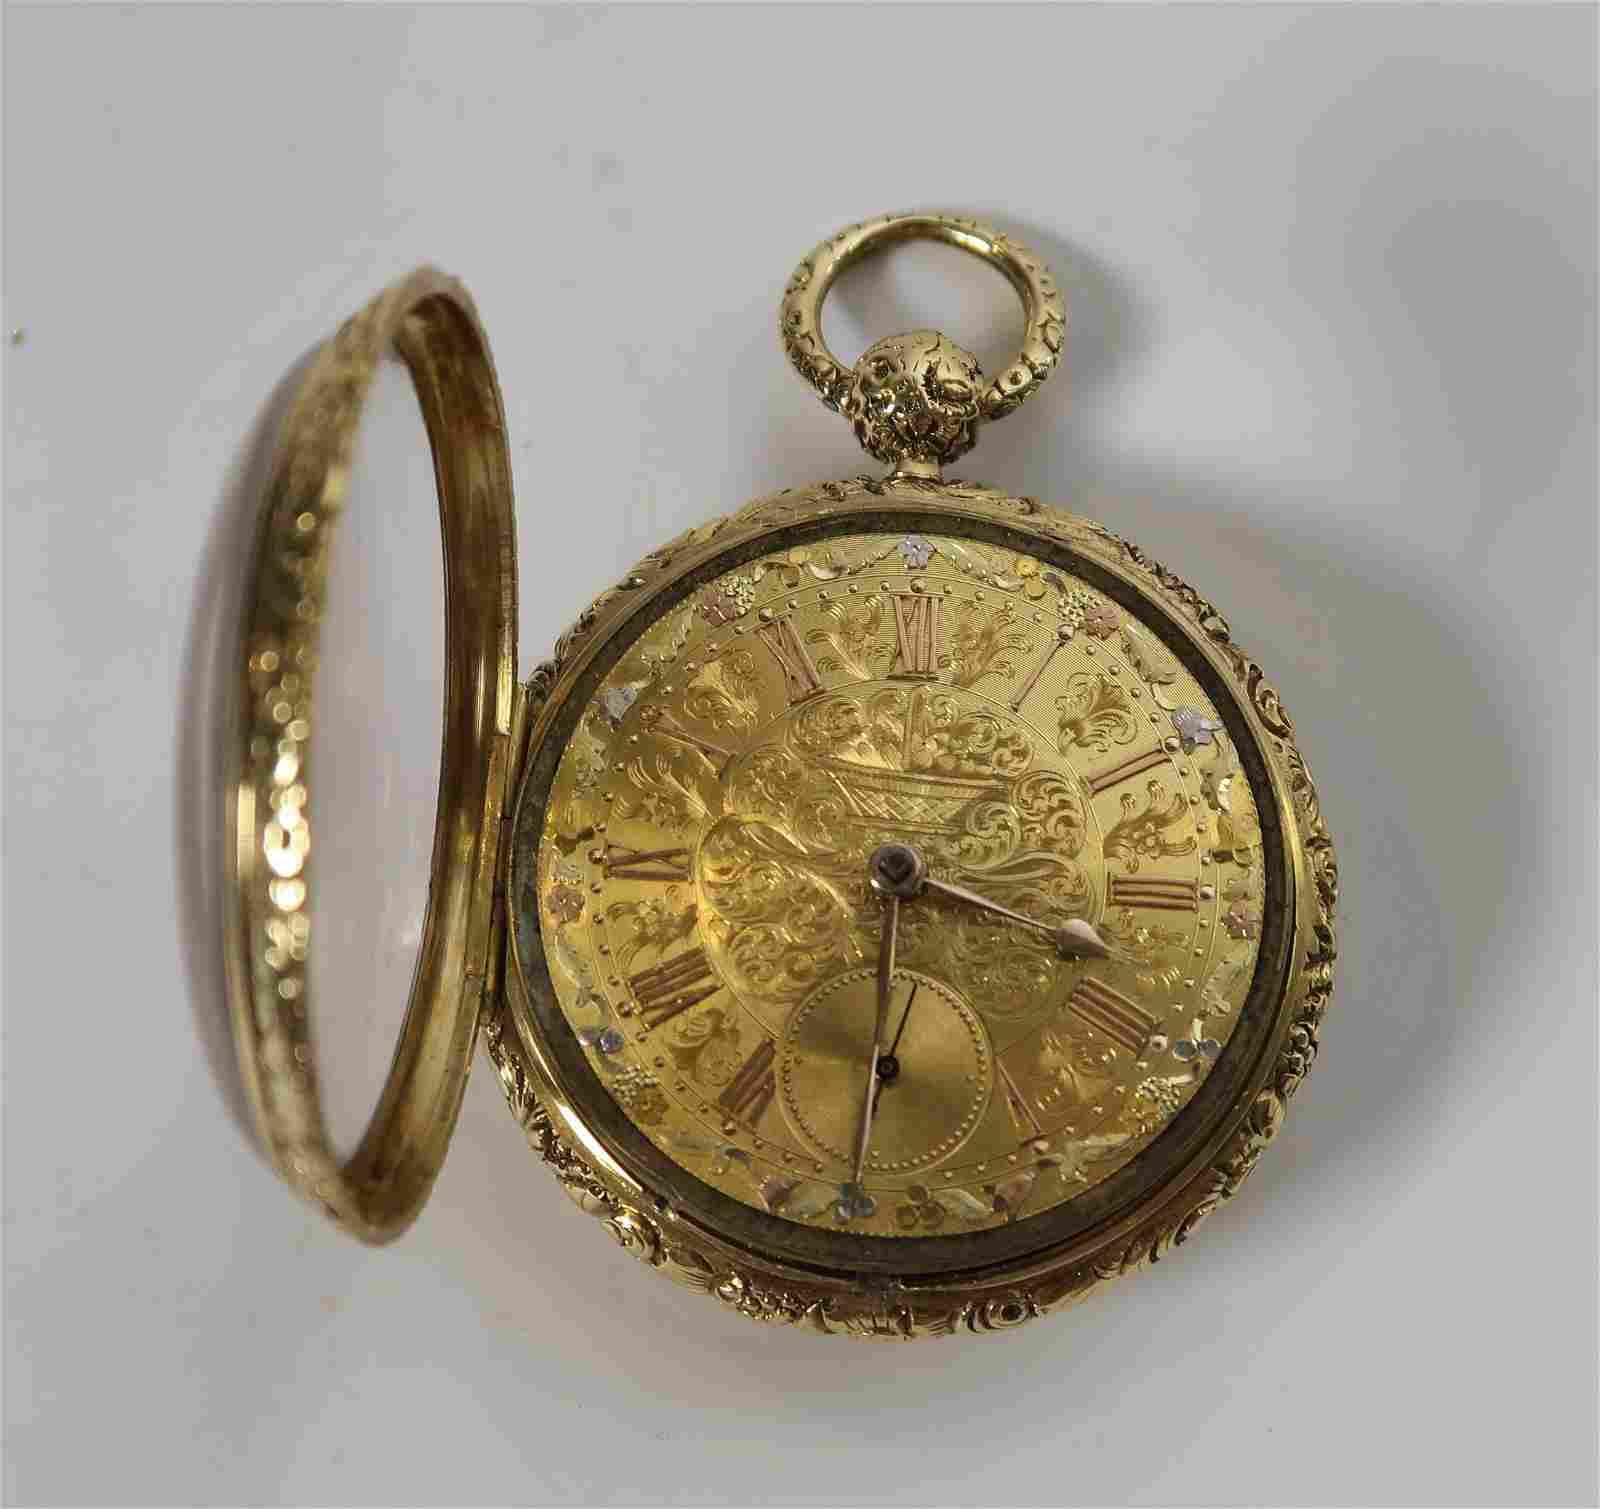 Solid 18k  Gold Pocket Watch,1820-1829